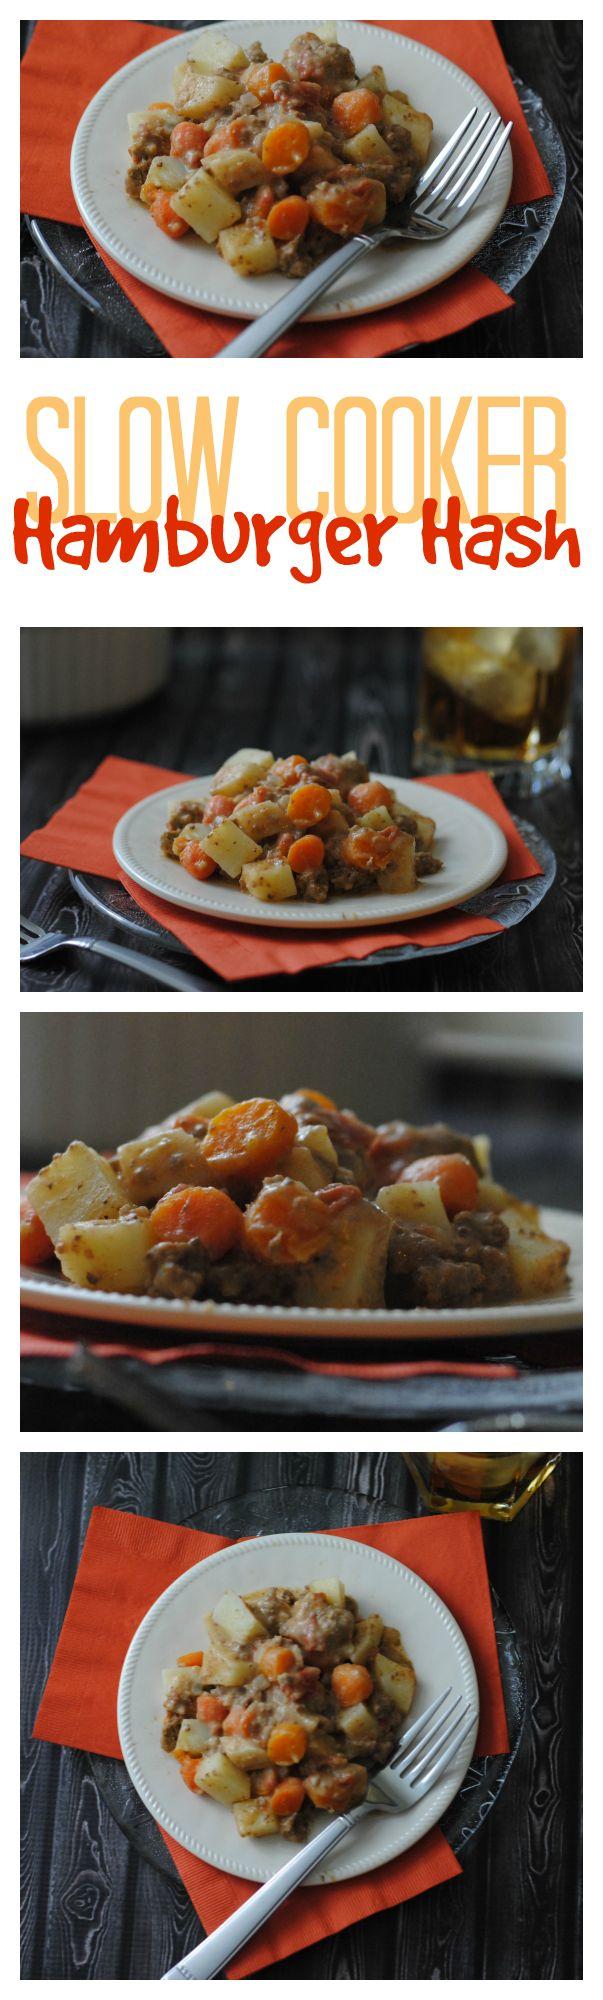 Hamburger Hash Slow Cooker Recipe,,,,#slowcookerrecipes #crockpotrecipes #comfortfood #crockpotcooking